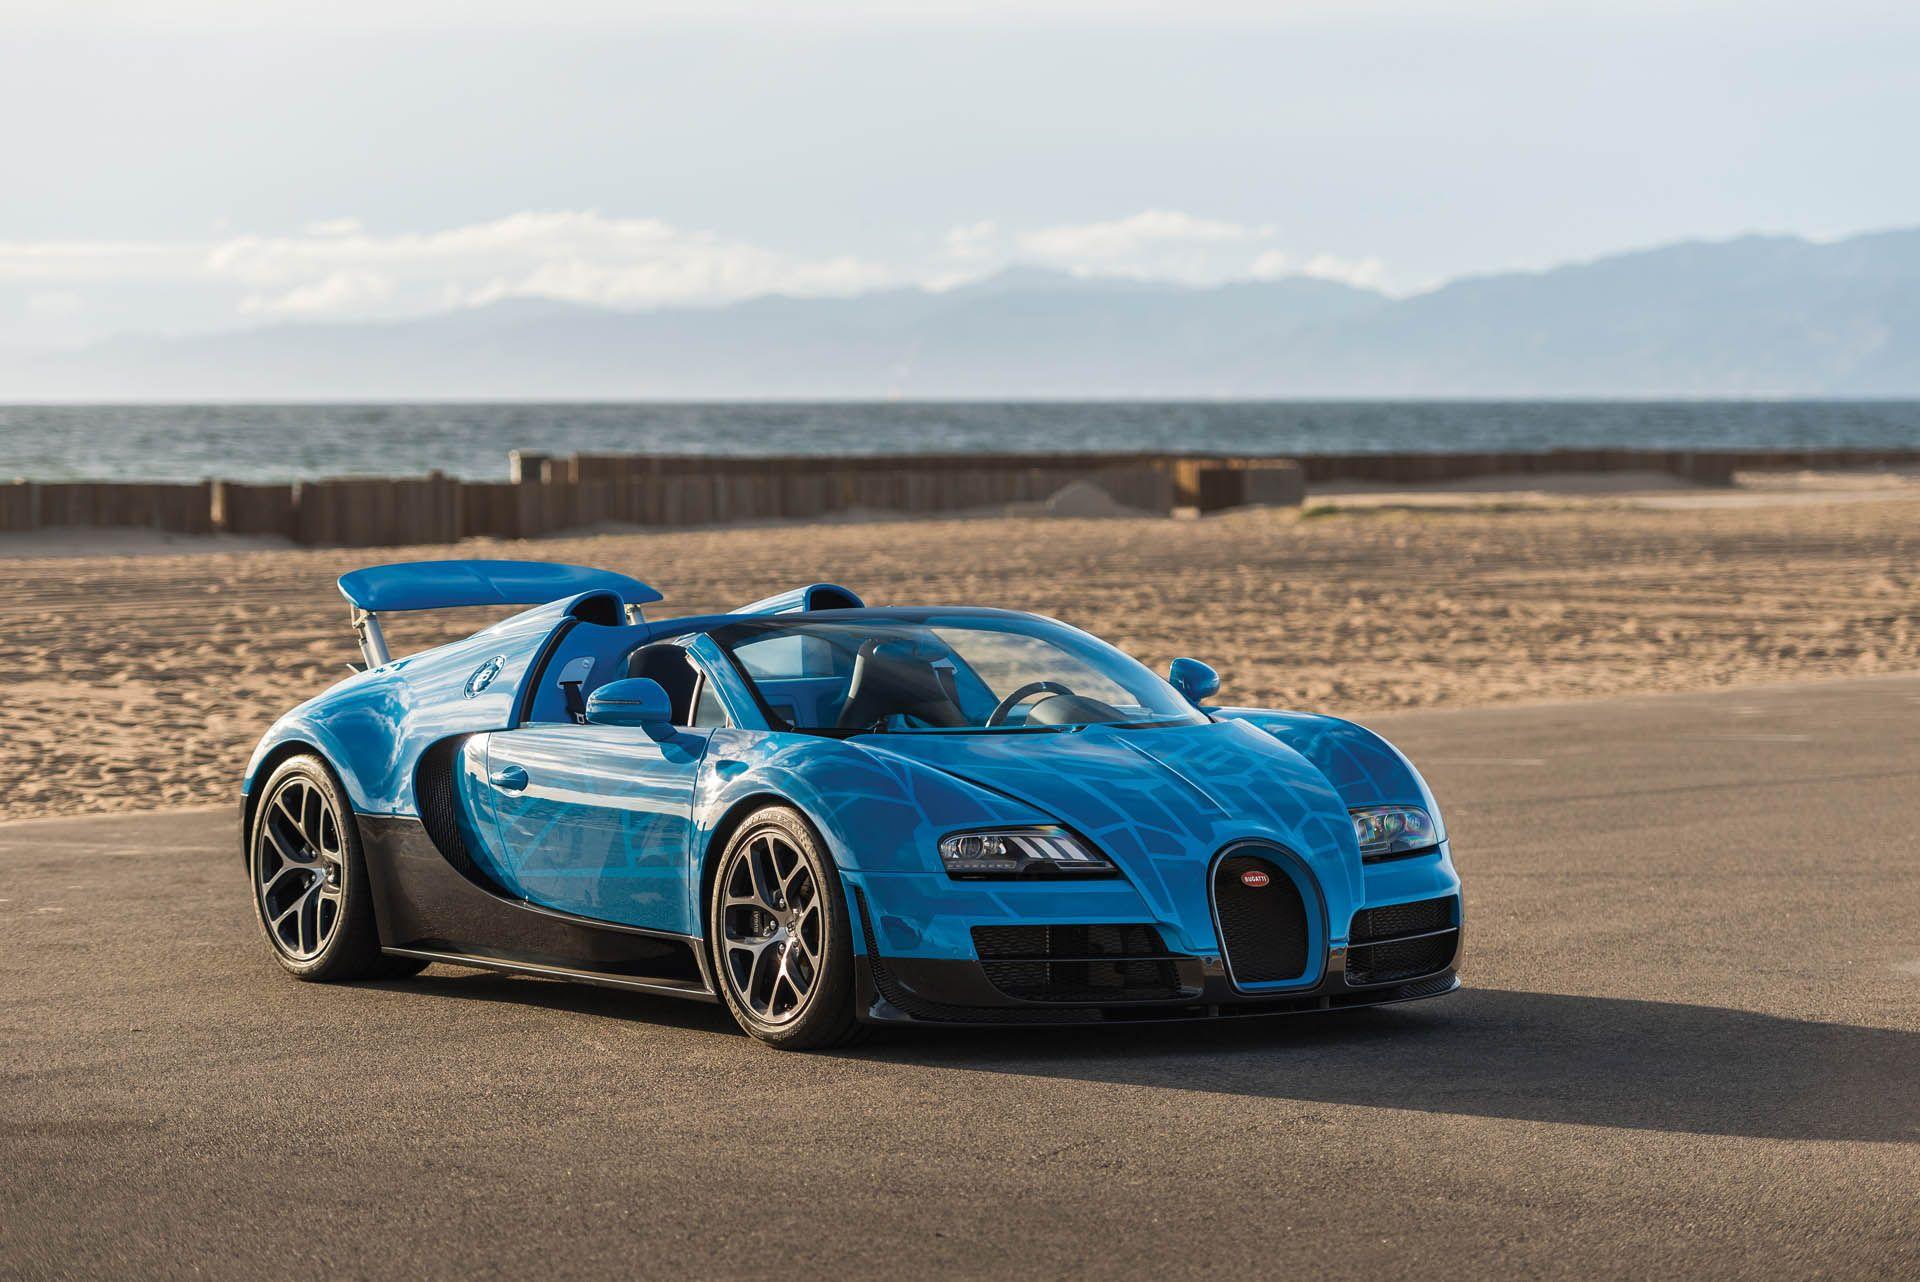 Transformers Themed Bugatti Veyron Is Heading Back To The Auction Block Bugatti Veyron Bugatti Veyron Super Sport Bugatti